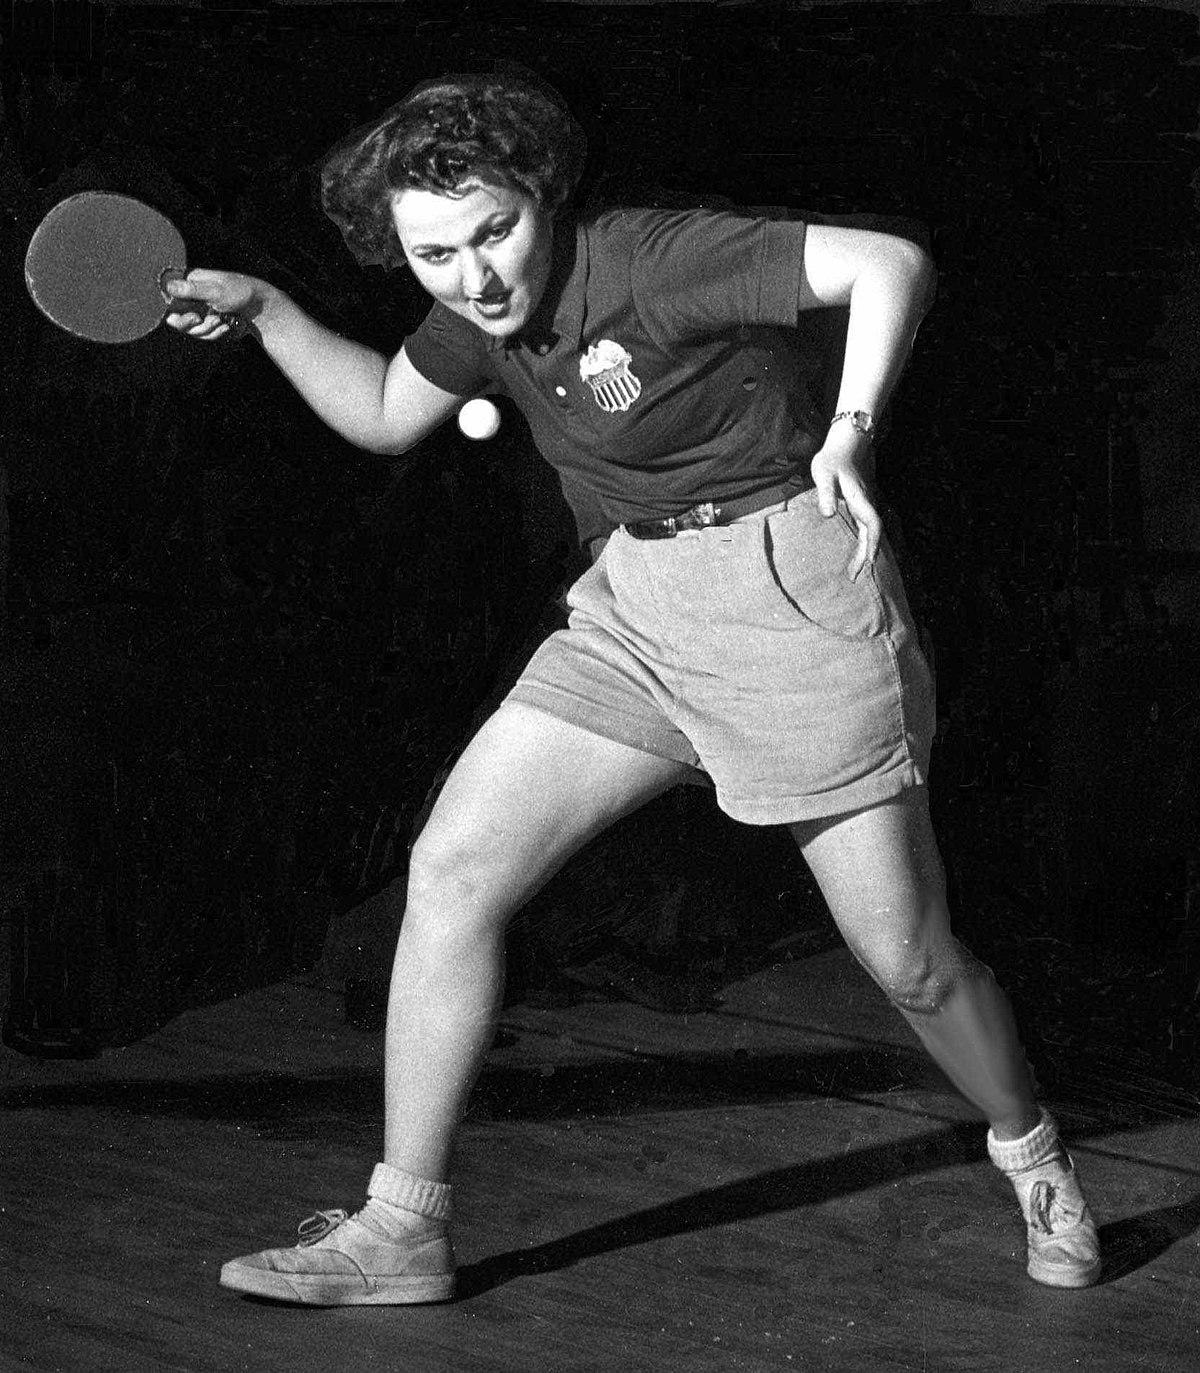 Communication on this topic: Lynn Ferguson, leah-neuberger-29x-us-table-tennis-champion/